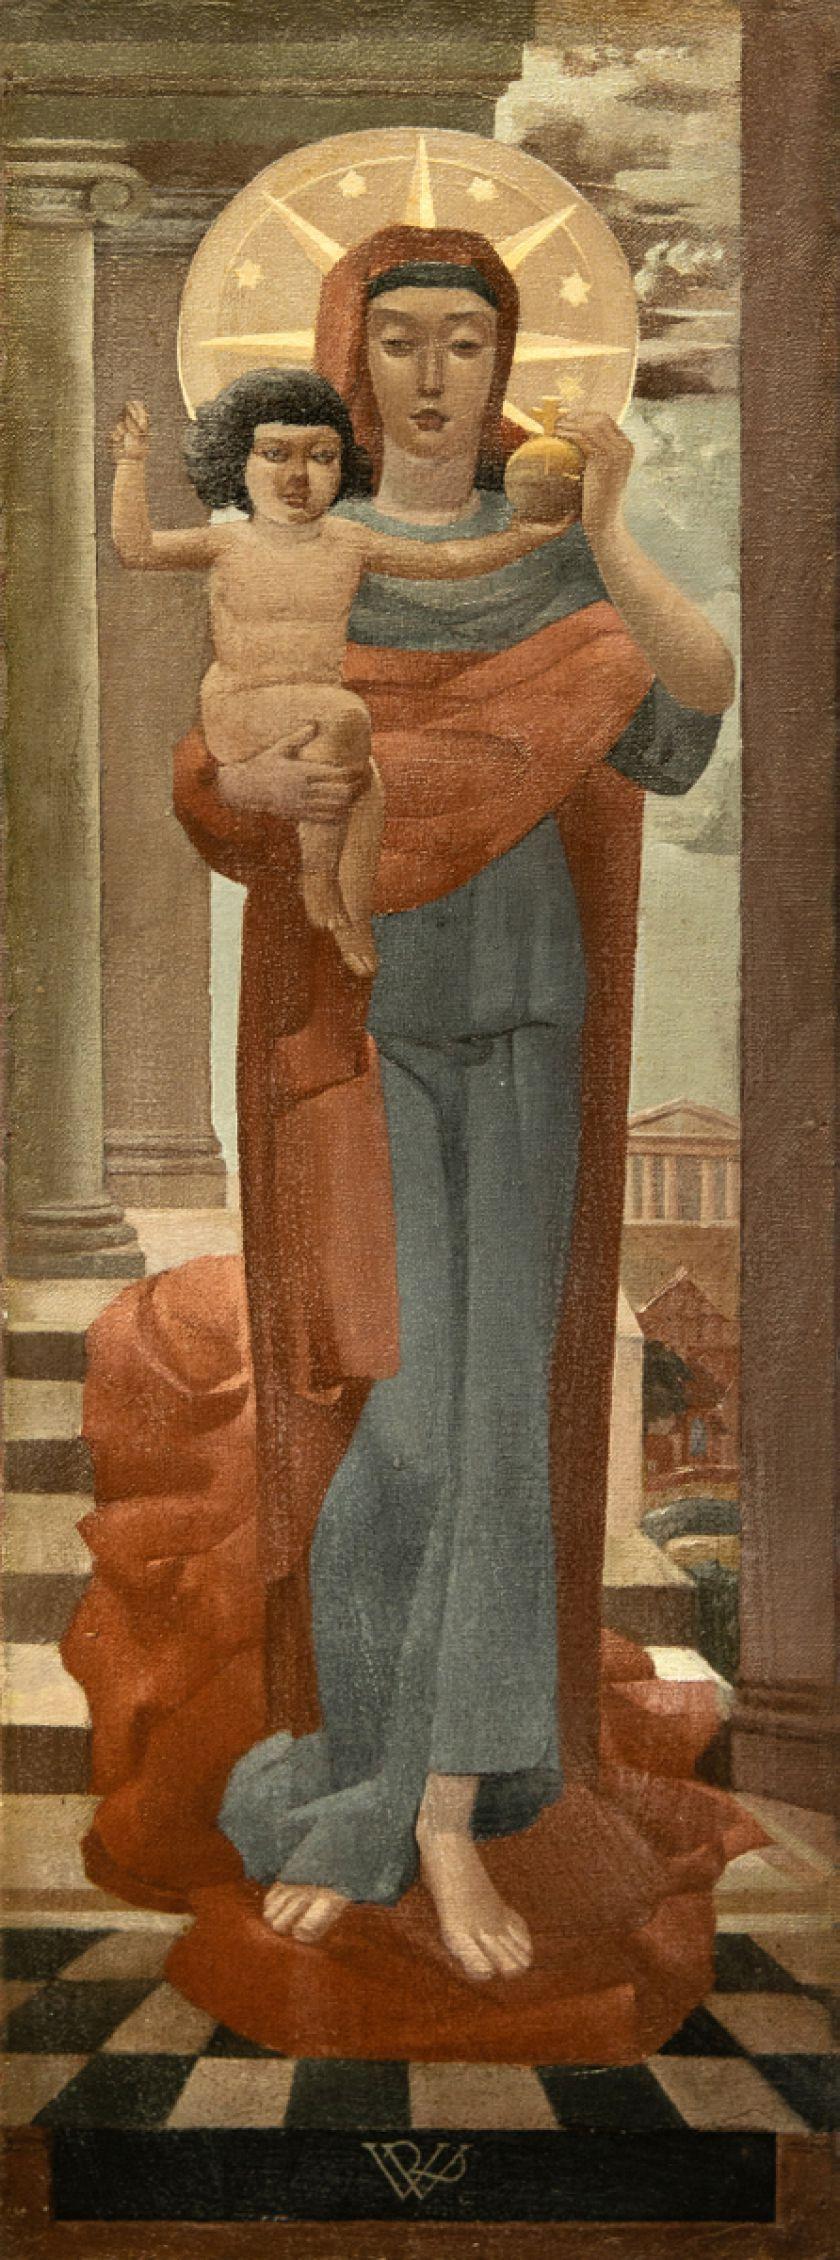 Unikalus XIX a. poeto Silvestro Valiūno rankraštis parduotas tik už 1800 Eur